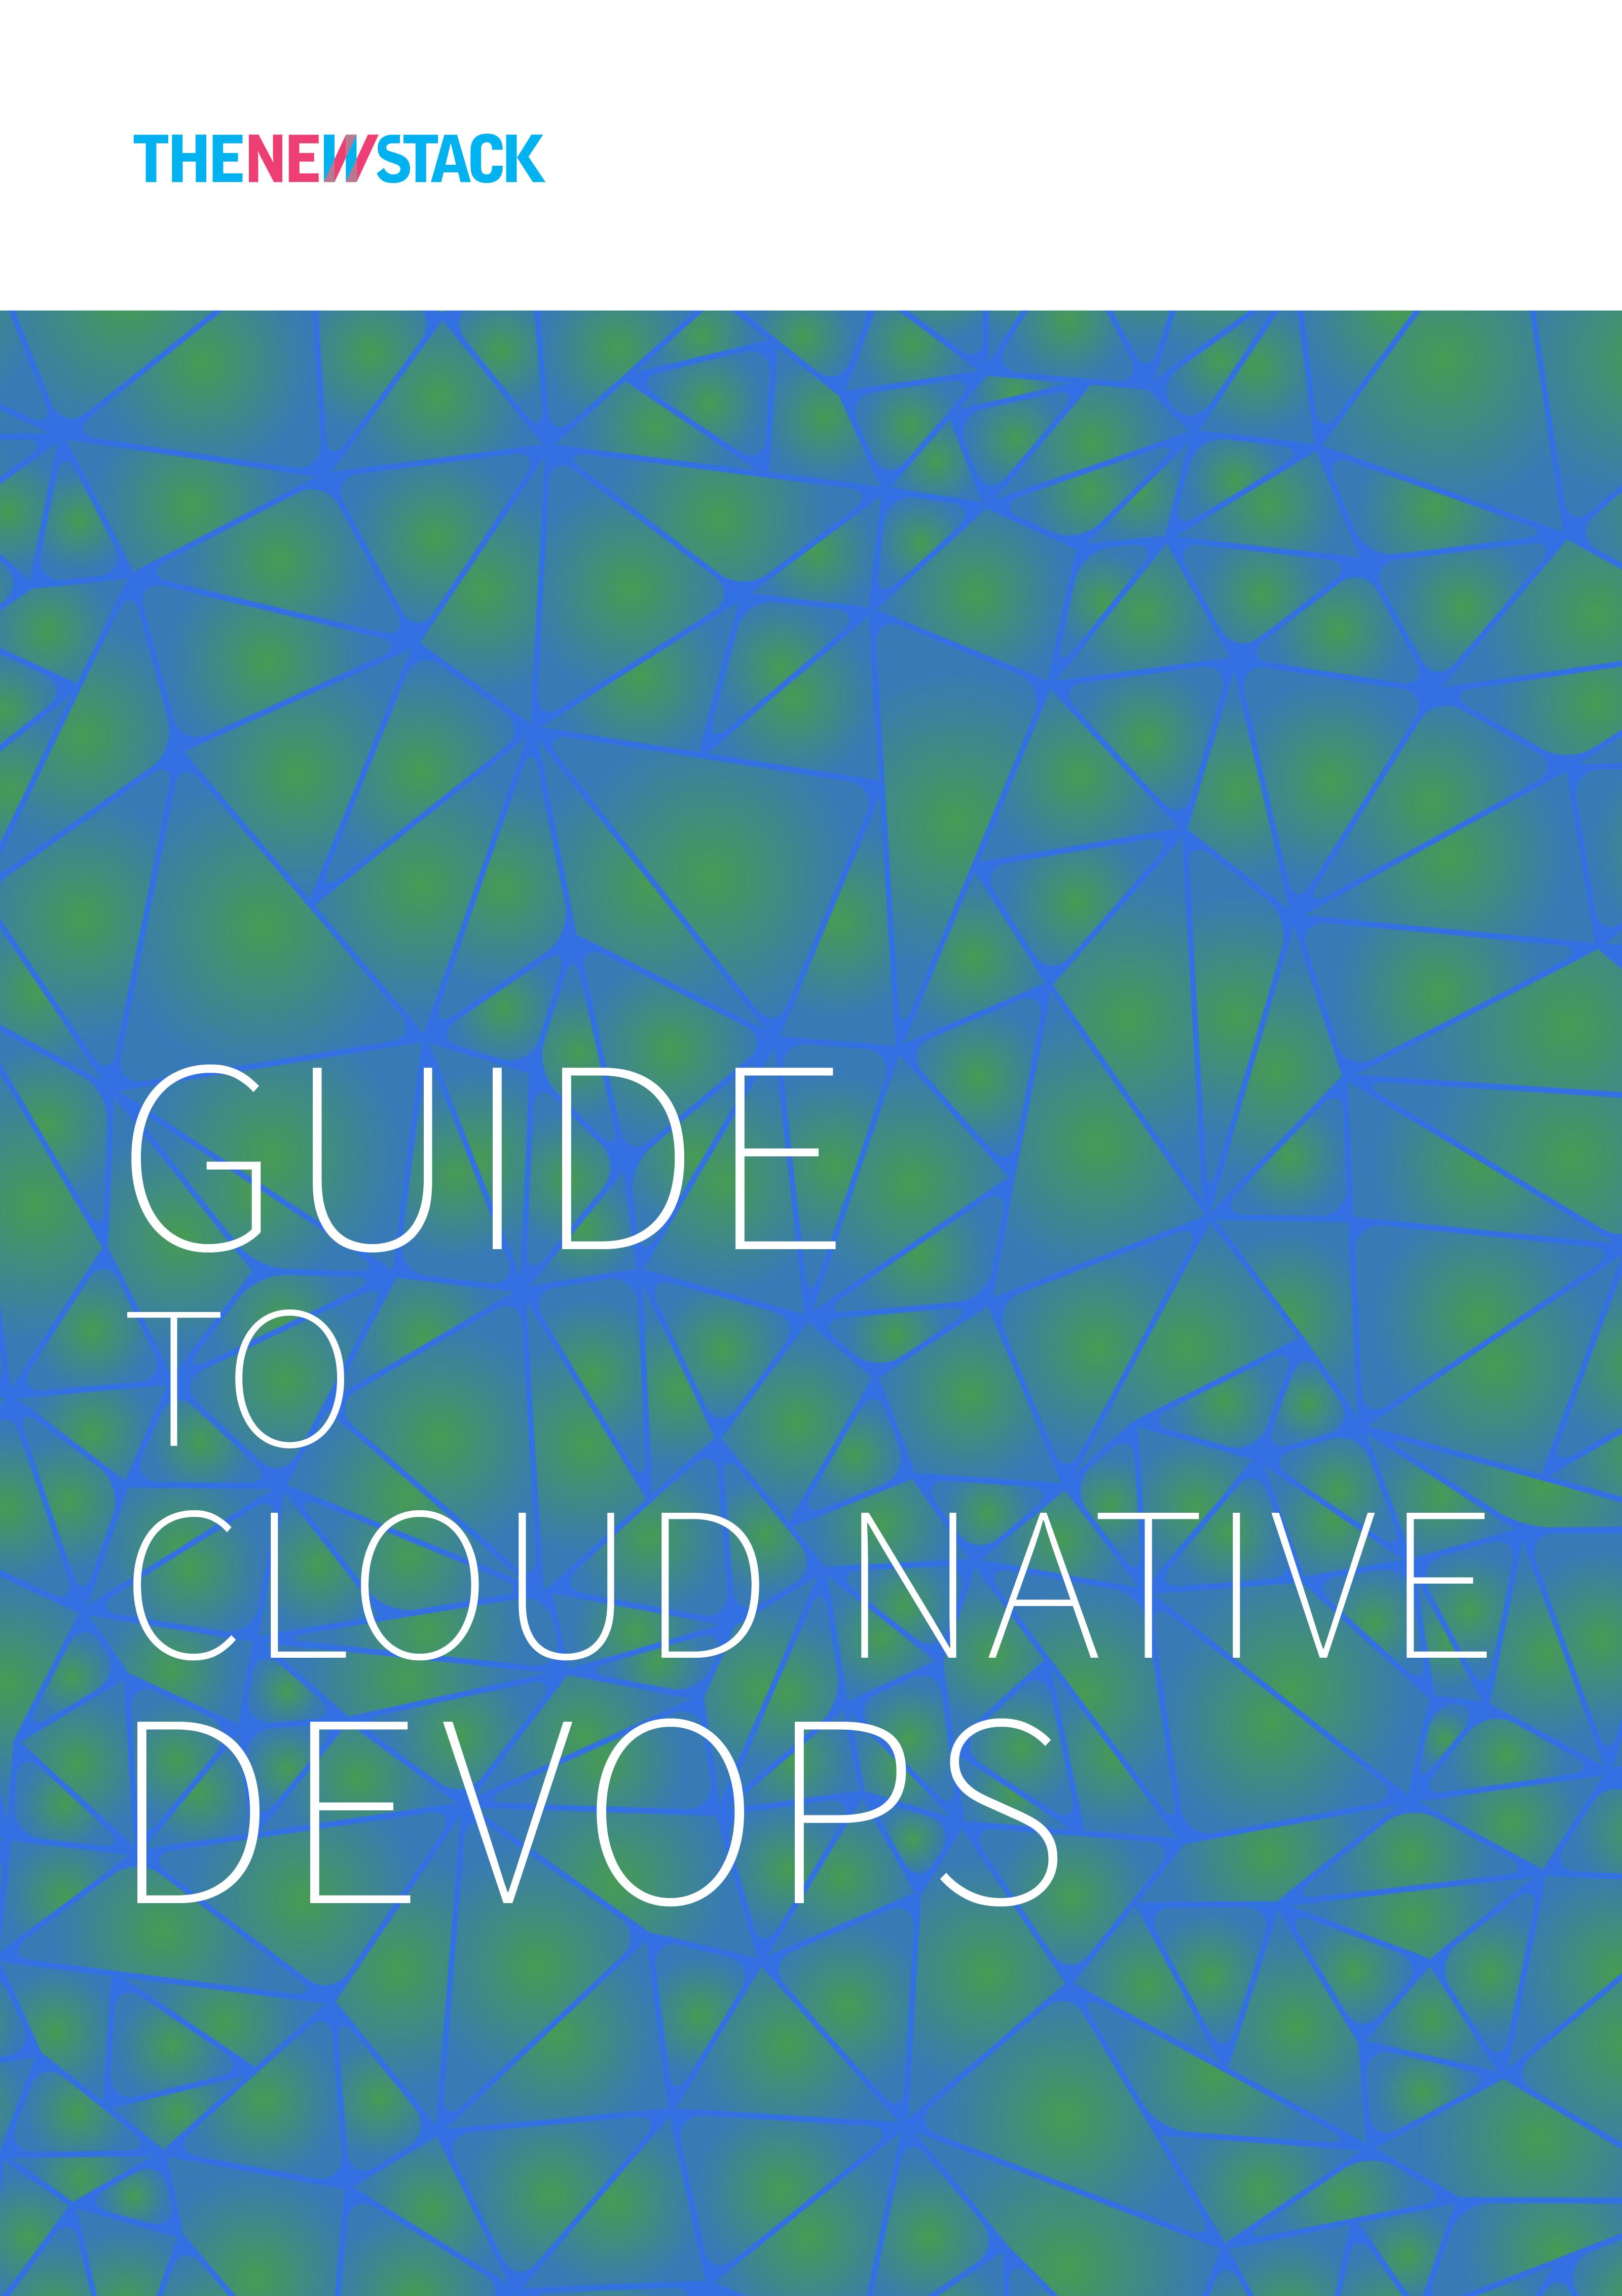 Guide to Cloud Native DevOps